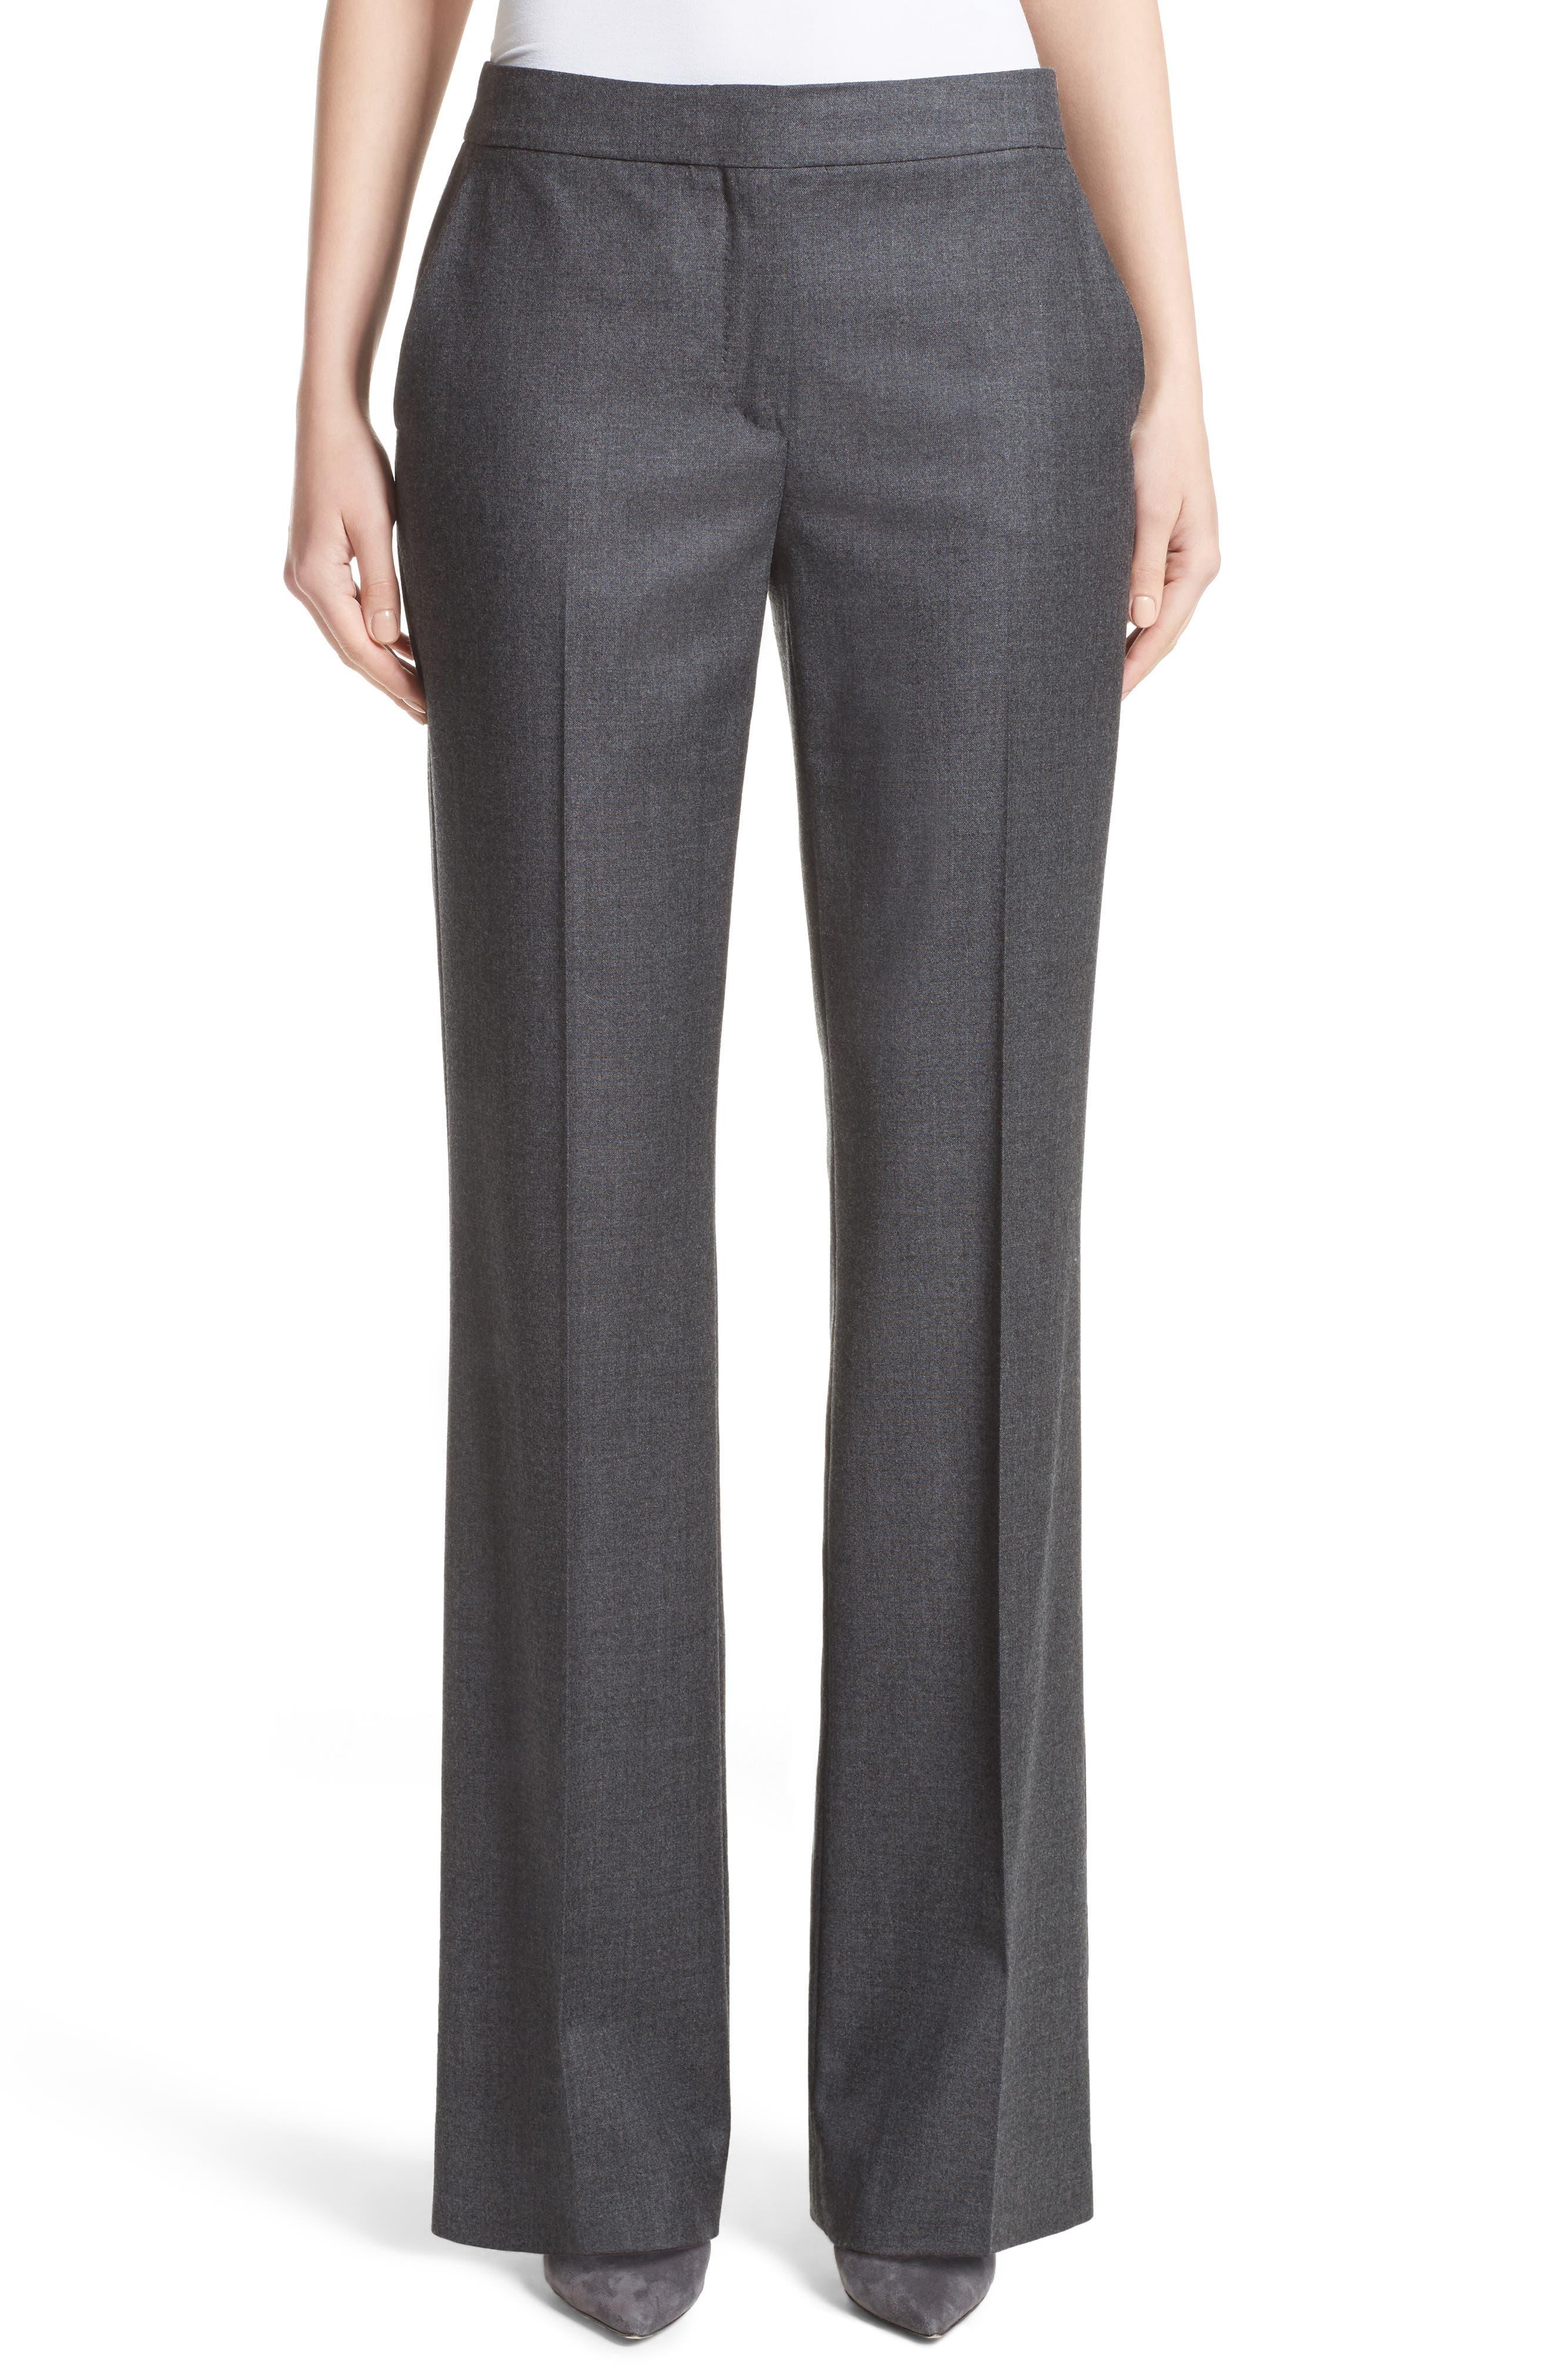 Pedone Wool Pants,                             Main thumbnail 1, color,                             Dark Grey